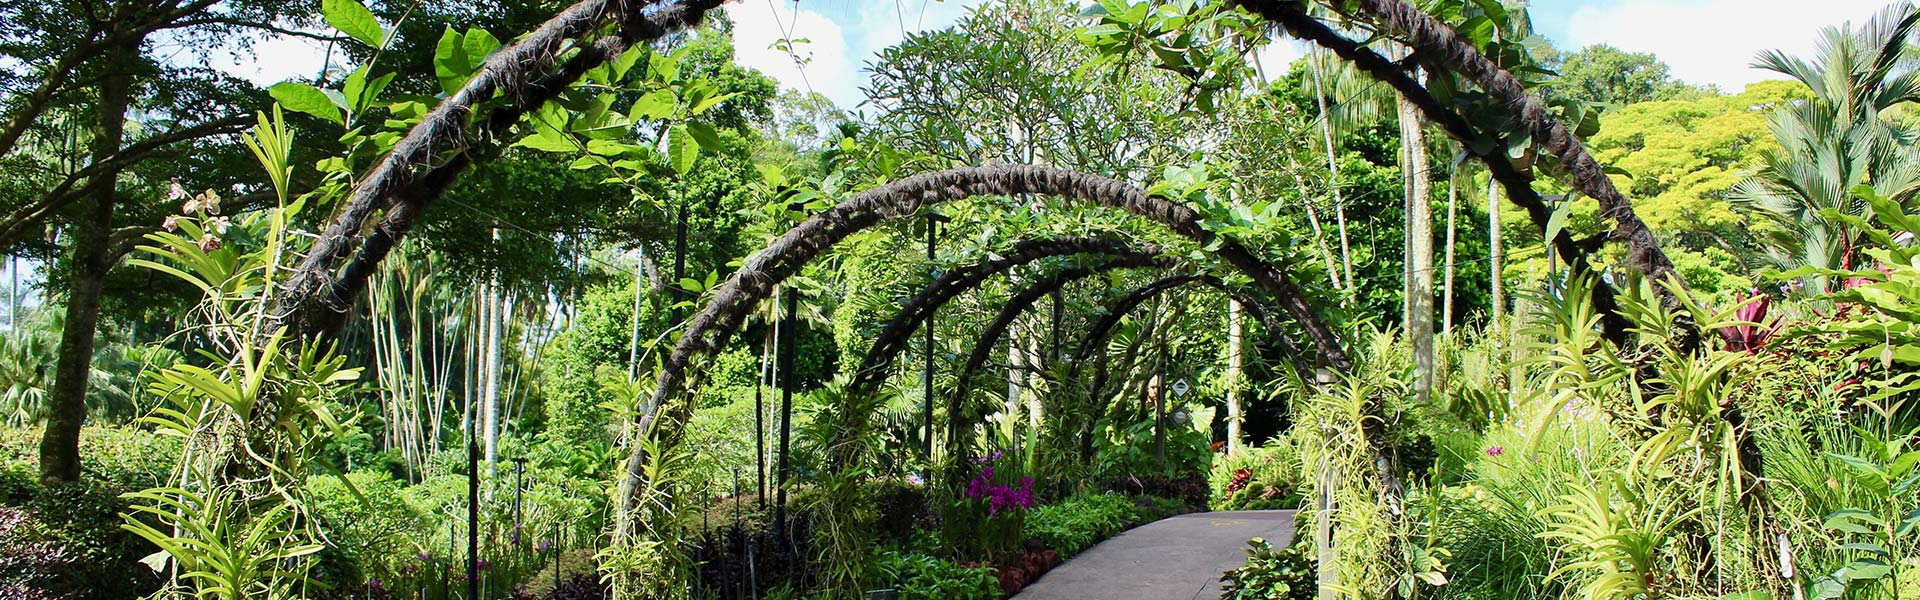 Pefect Ten - Botanic Gardens Banner